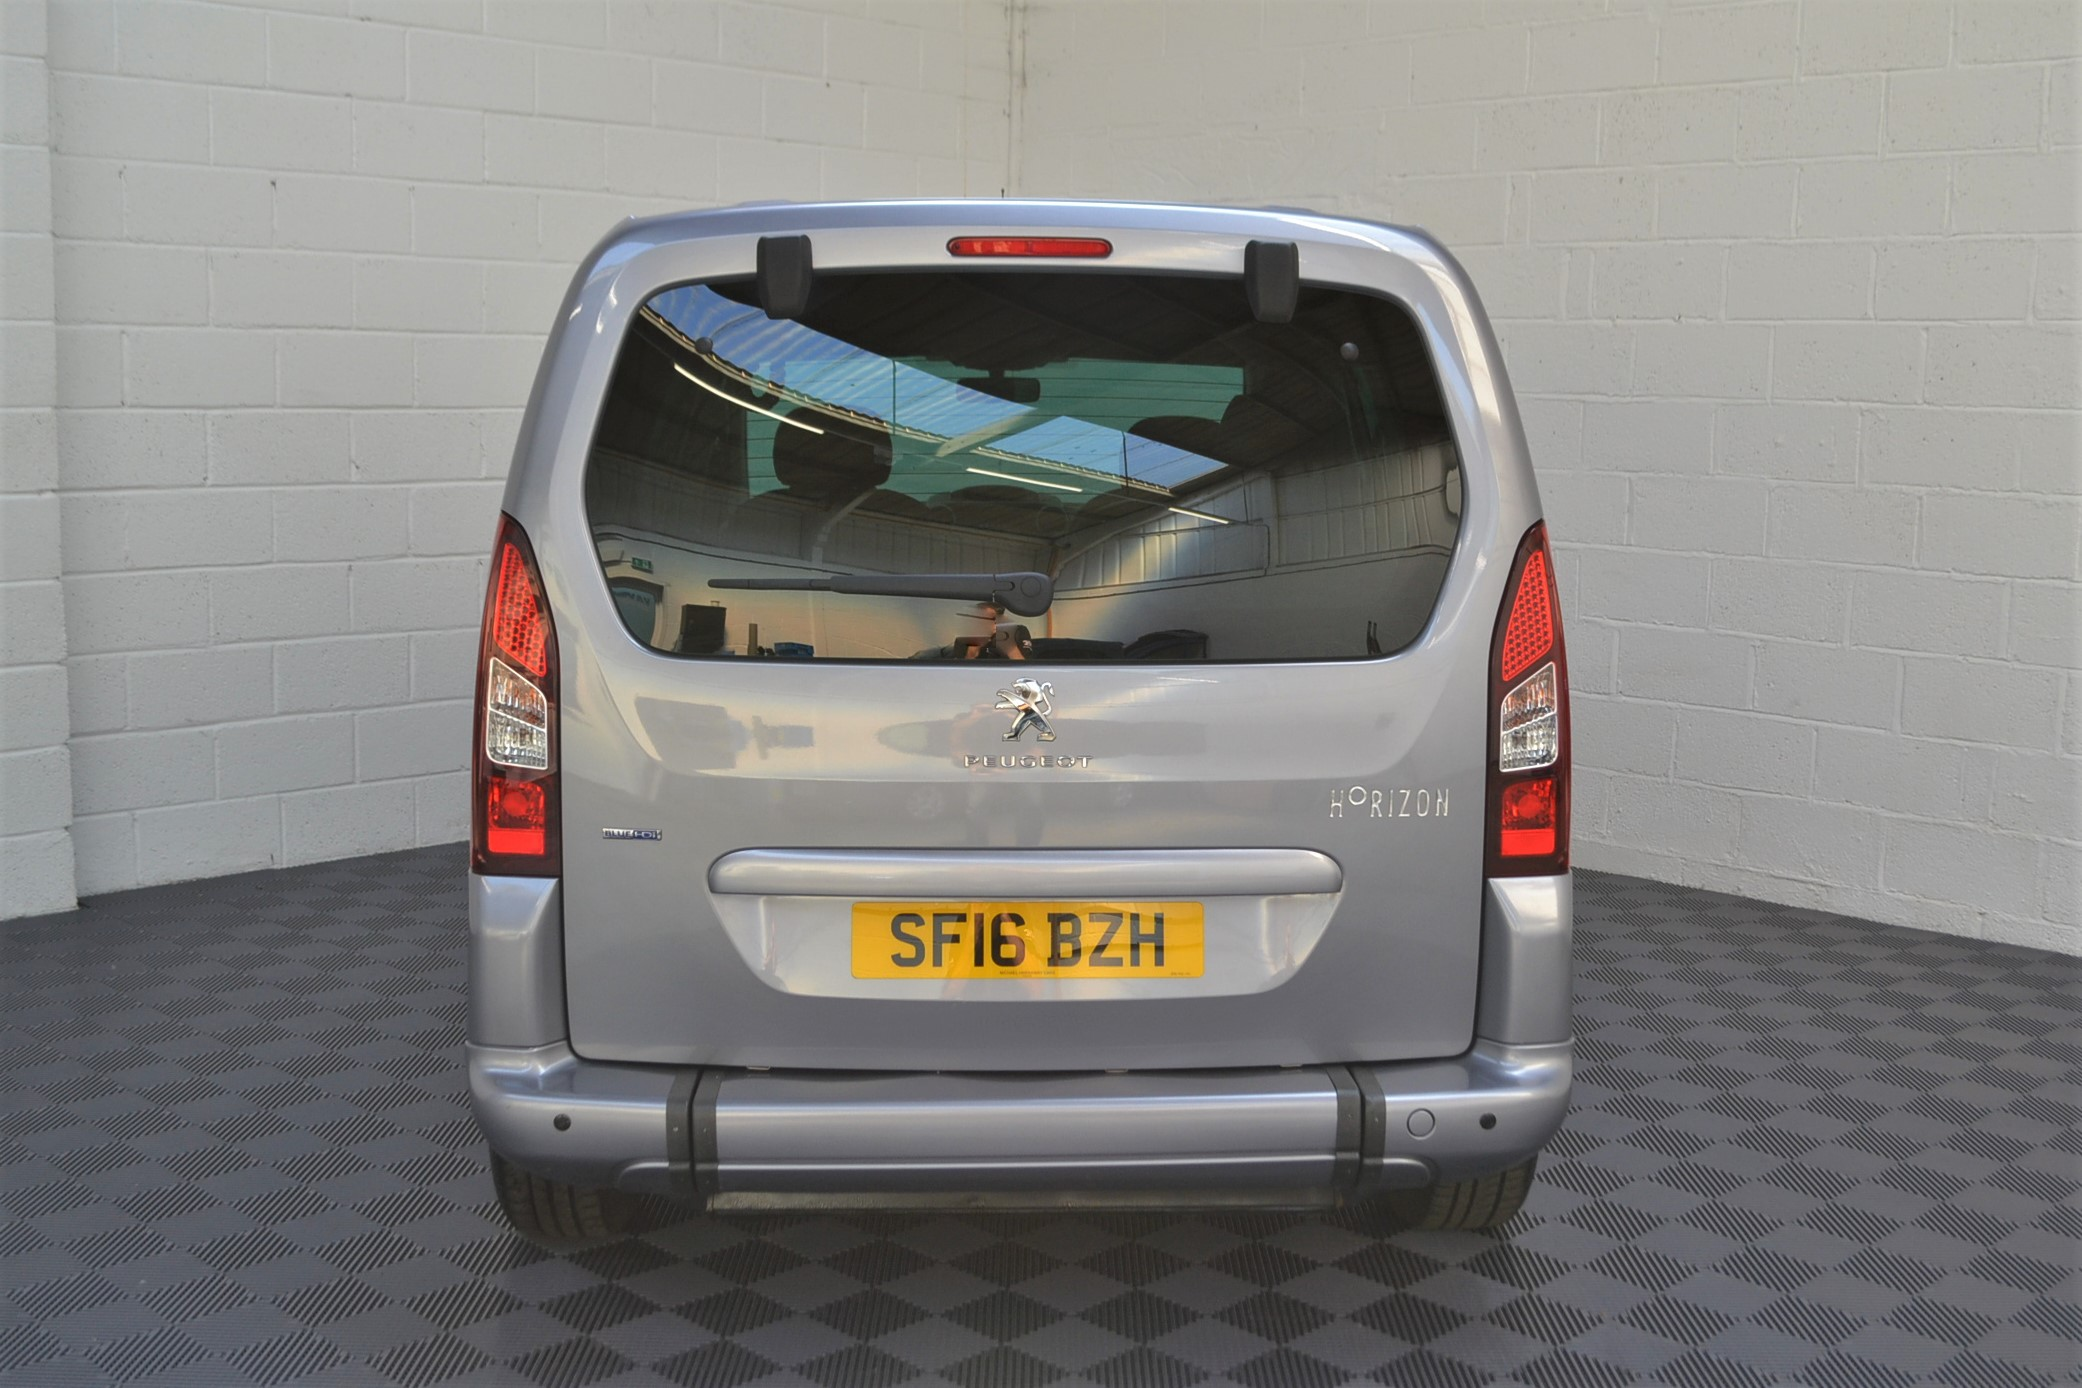 WAV Cars For Sale Bristol Wheelchair Accessible Vehicles Used For Sale Somerset Devon Dorset Bath Peugeot Partner Auto 3